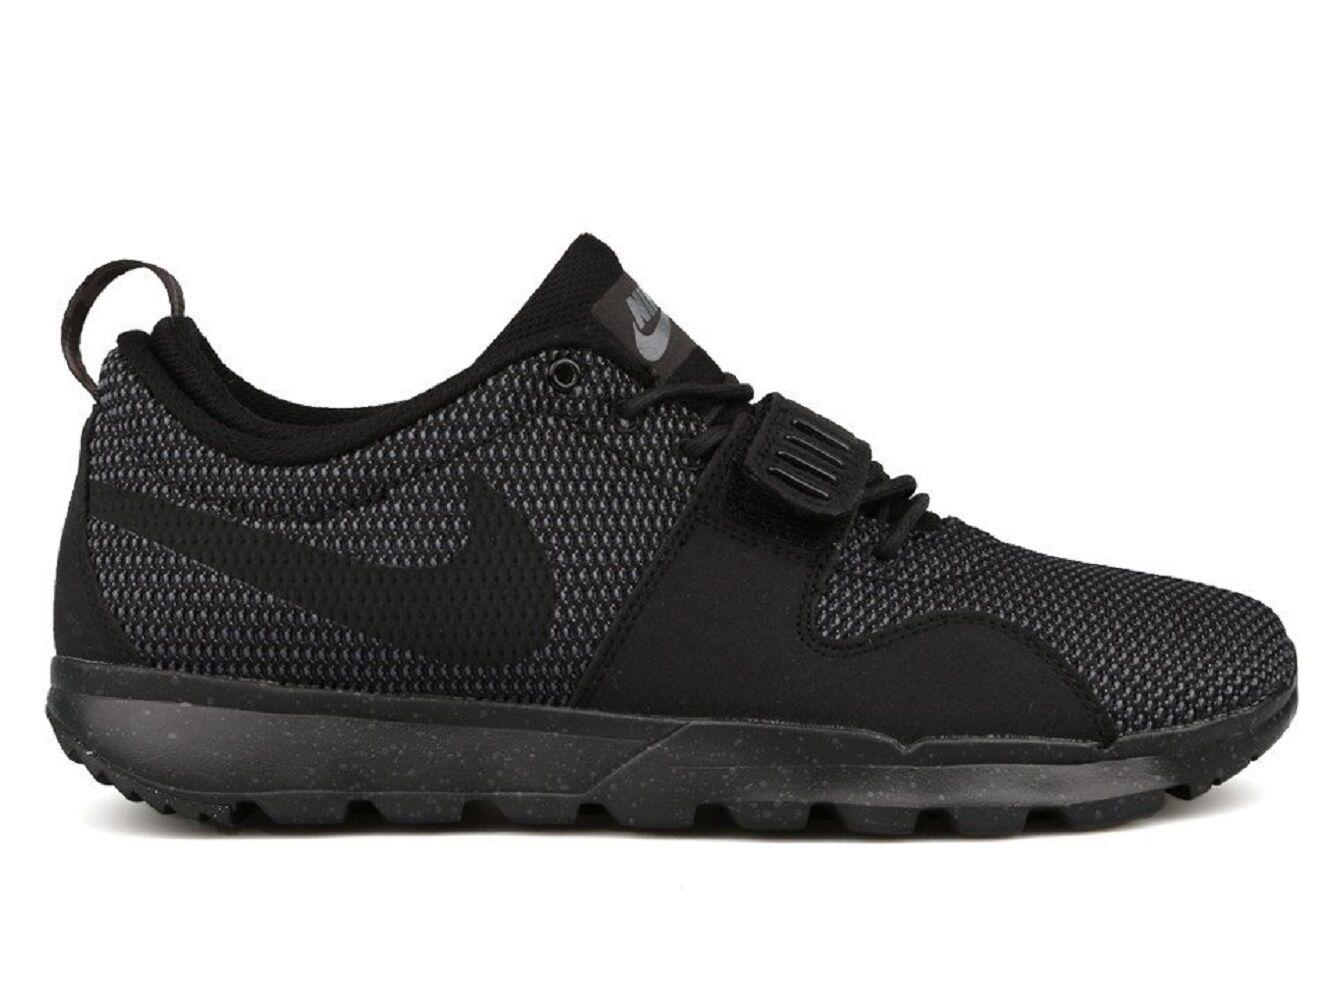 32d308b1ee3 Nike TRAINERENDOR Black Dark Dark Dark Grey Athletic Skate 616575-002 (501)  Men s